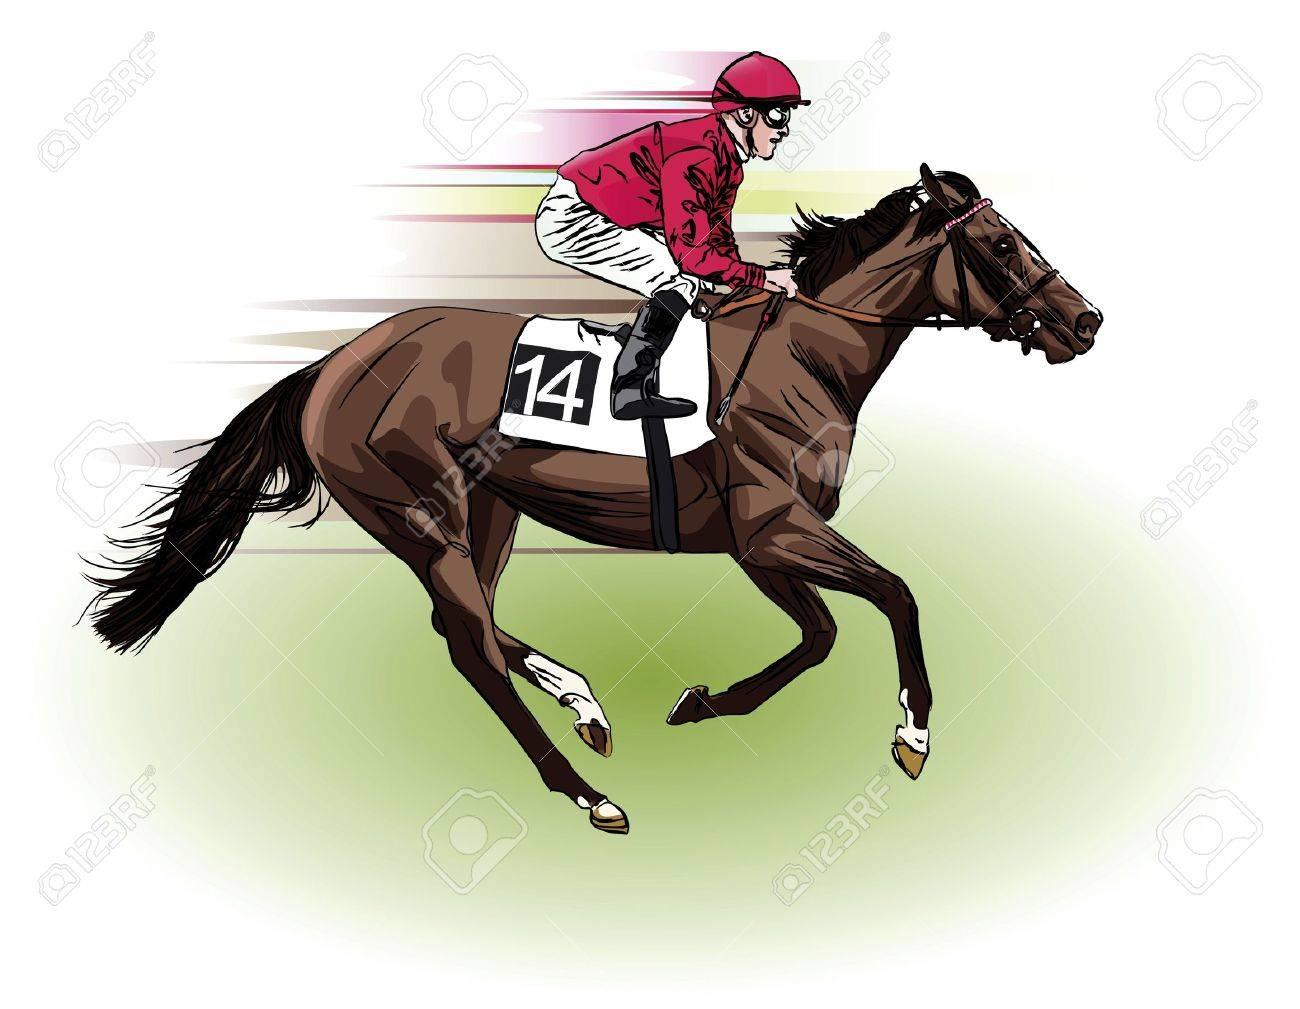 A Racing Horse And Jockey Stock Photo